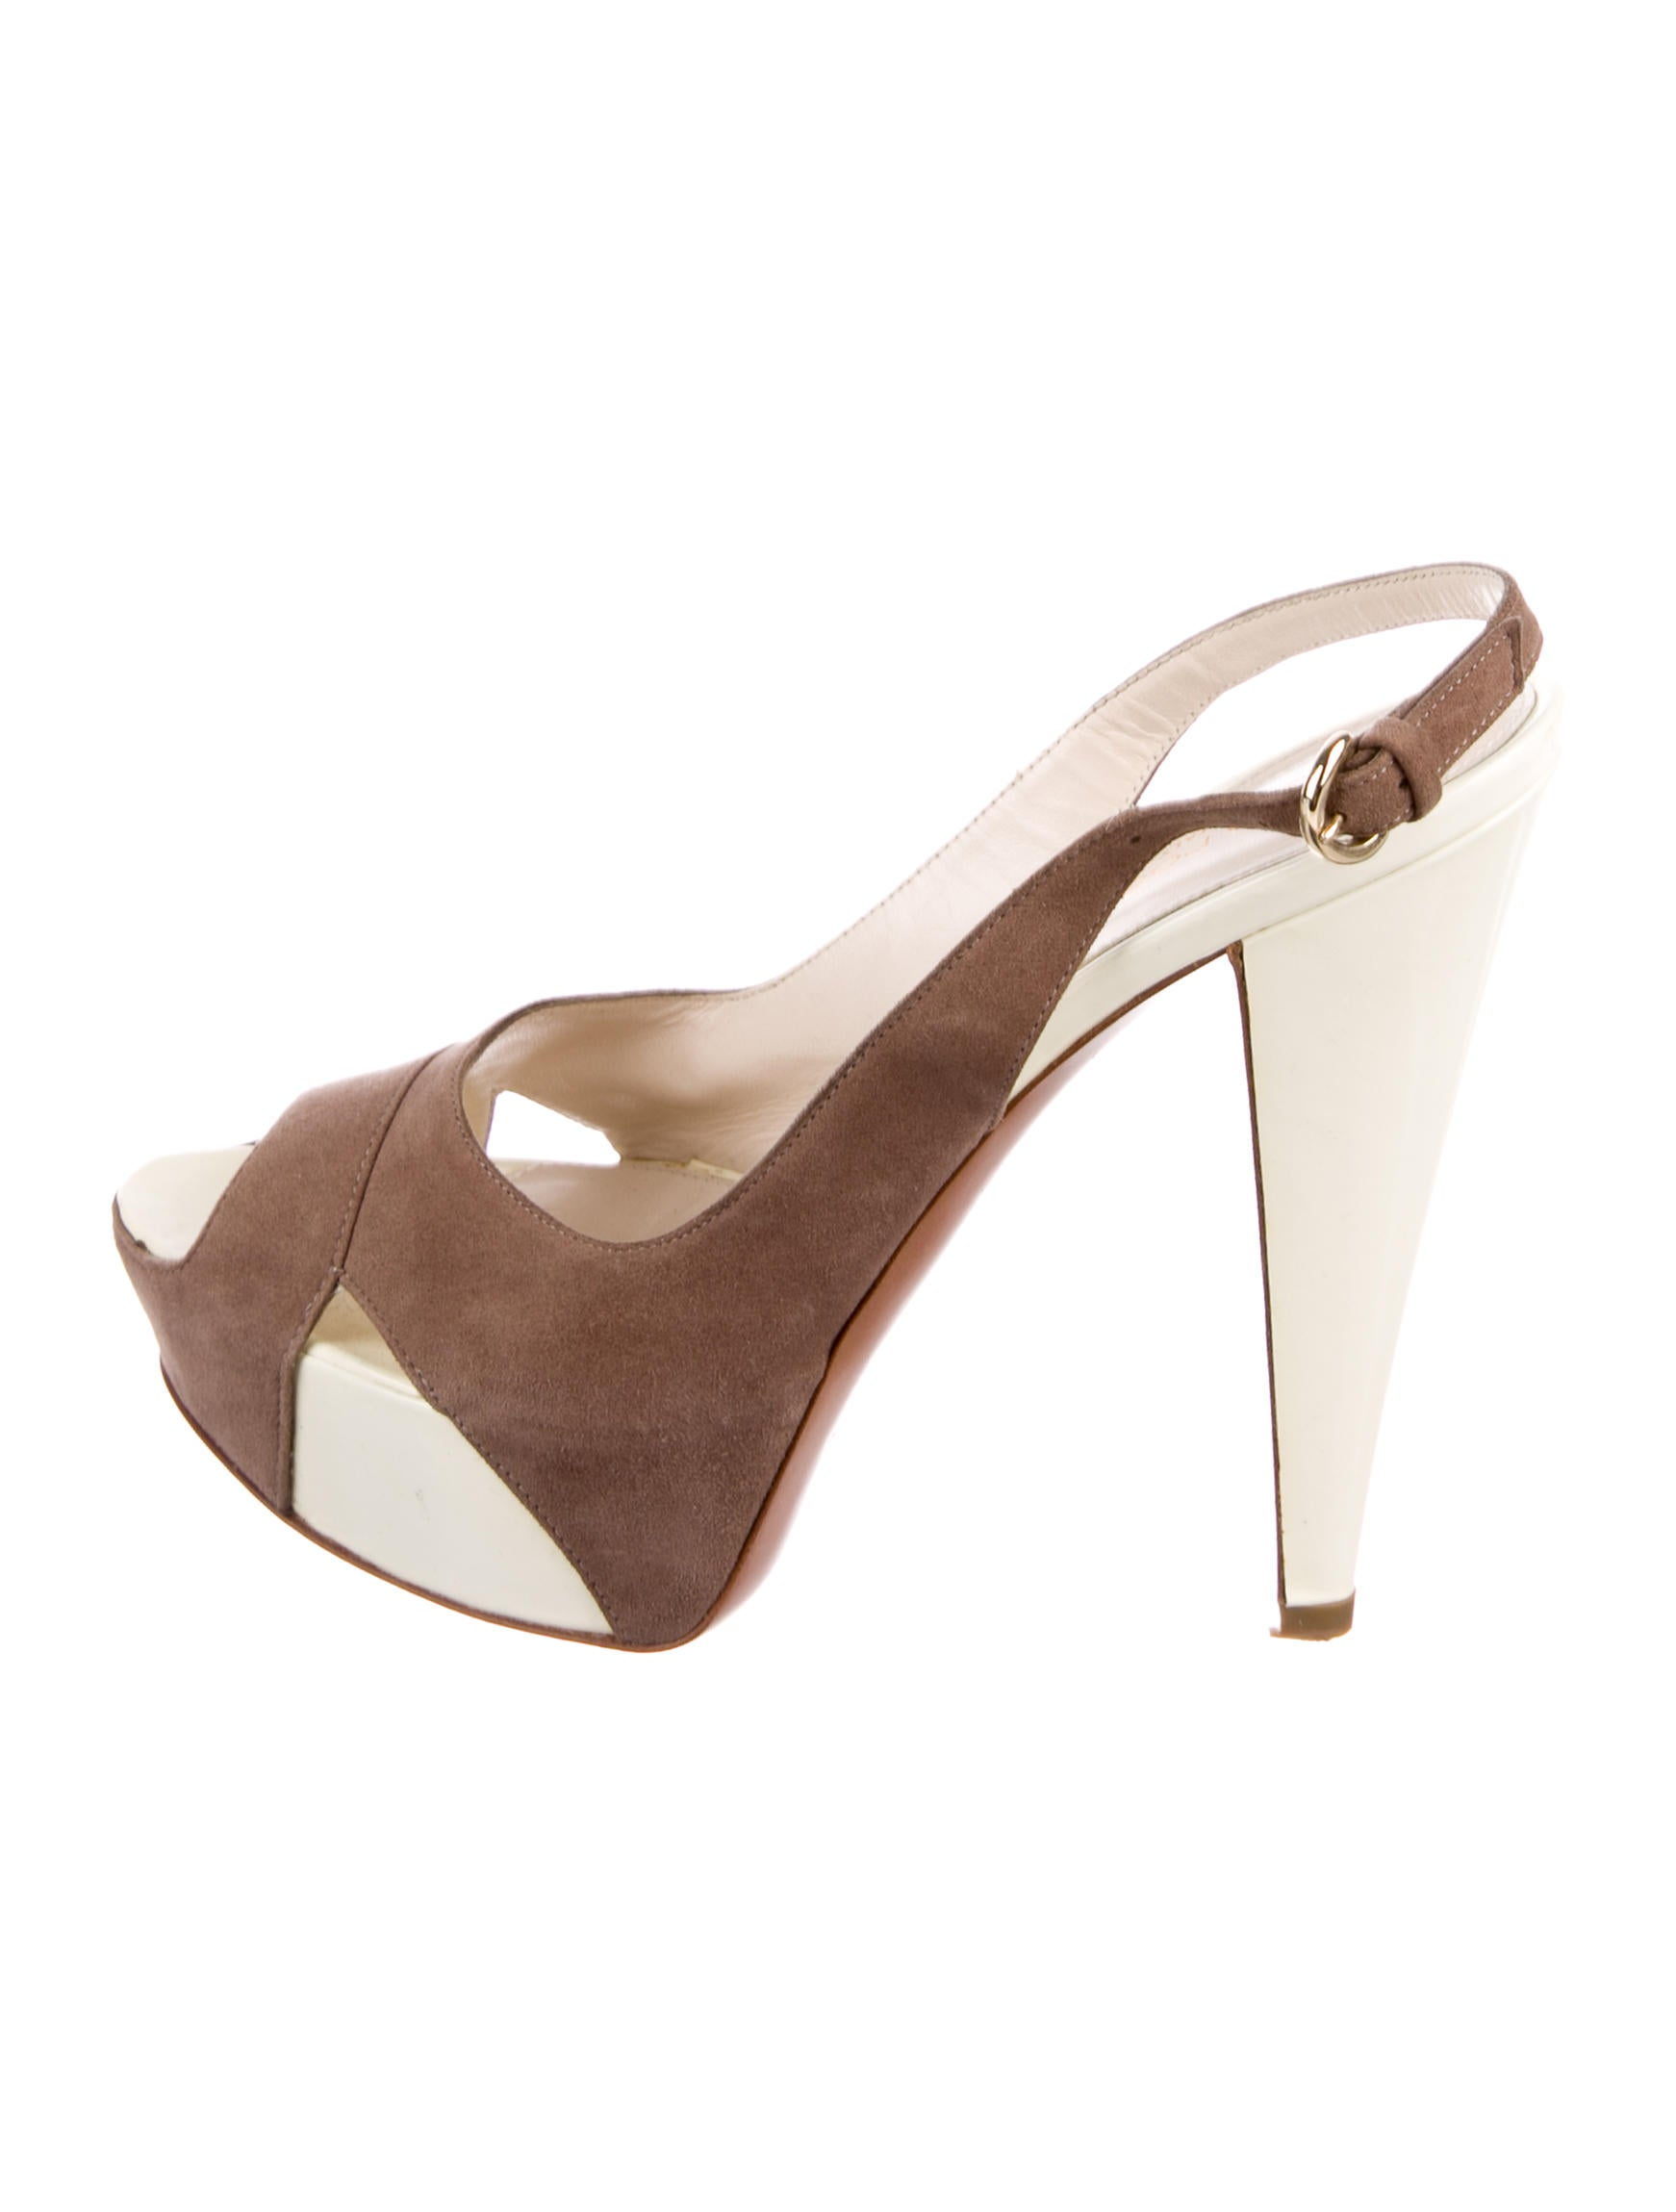 discount footlocker Sergio Rossi Perfection Slingback Sandals cheap sale popular jGG6LG